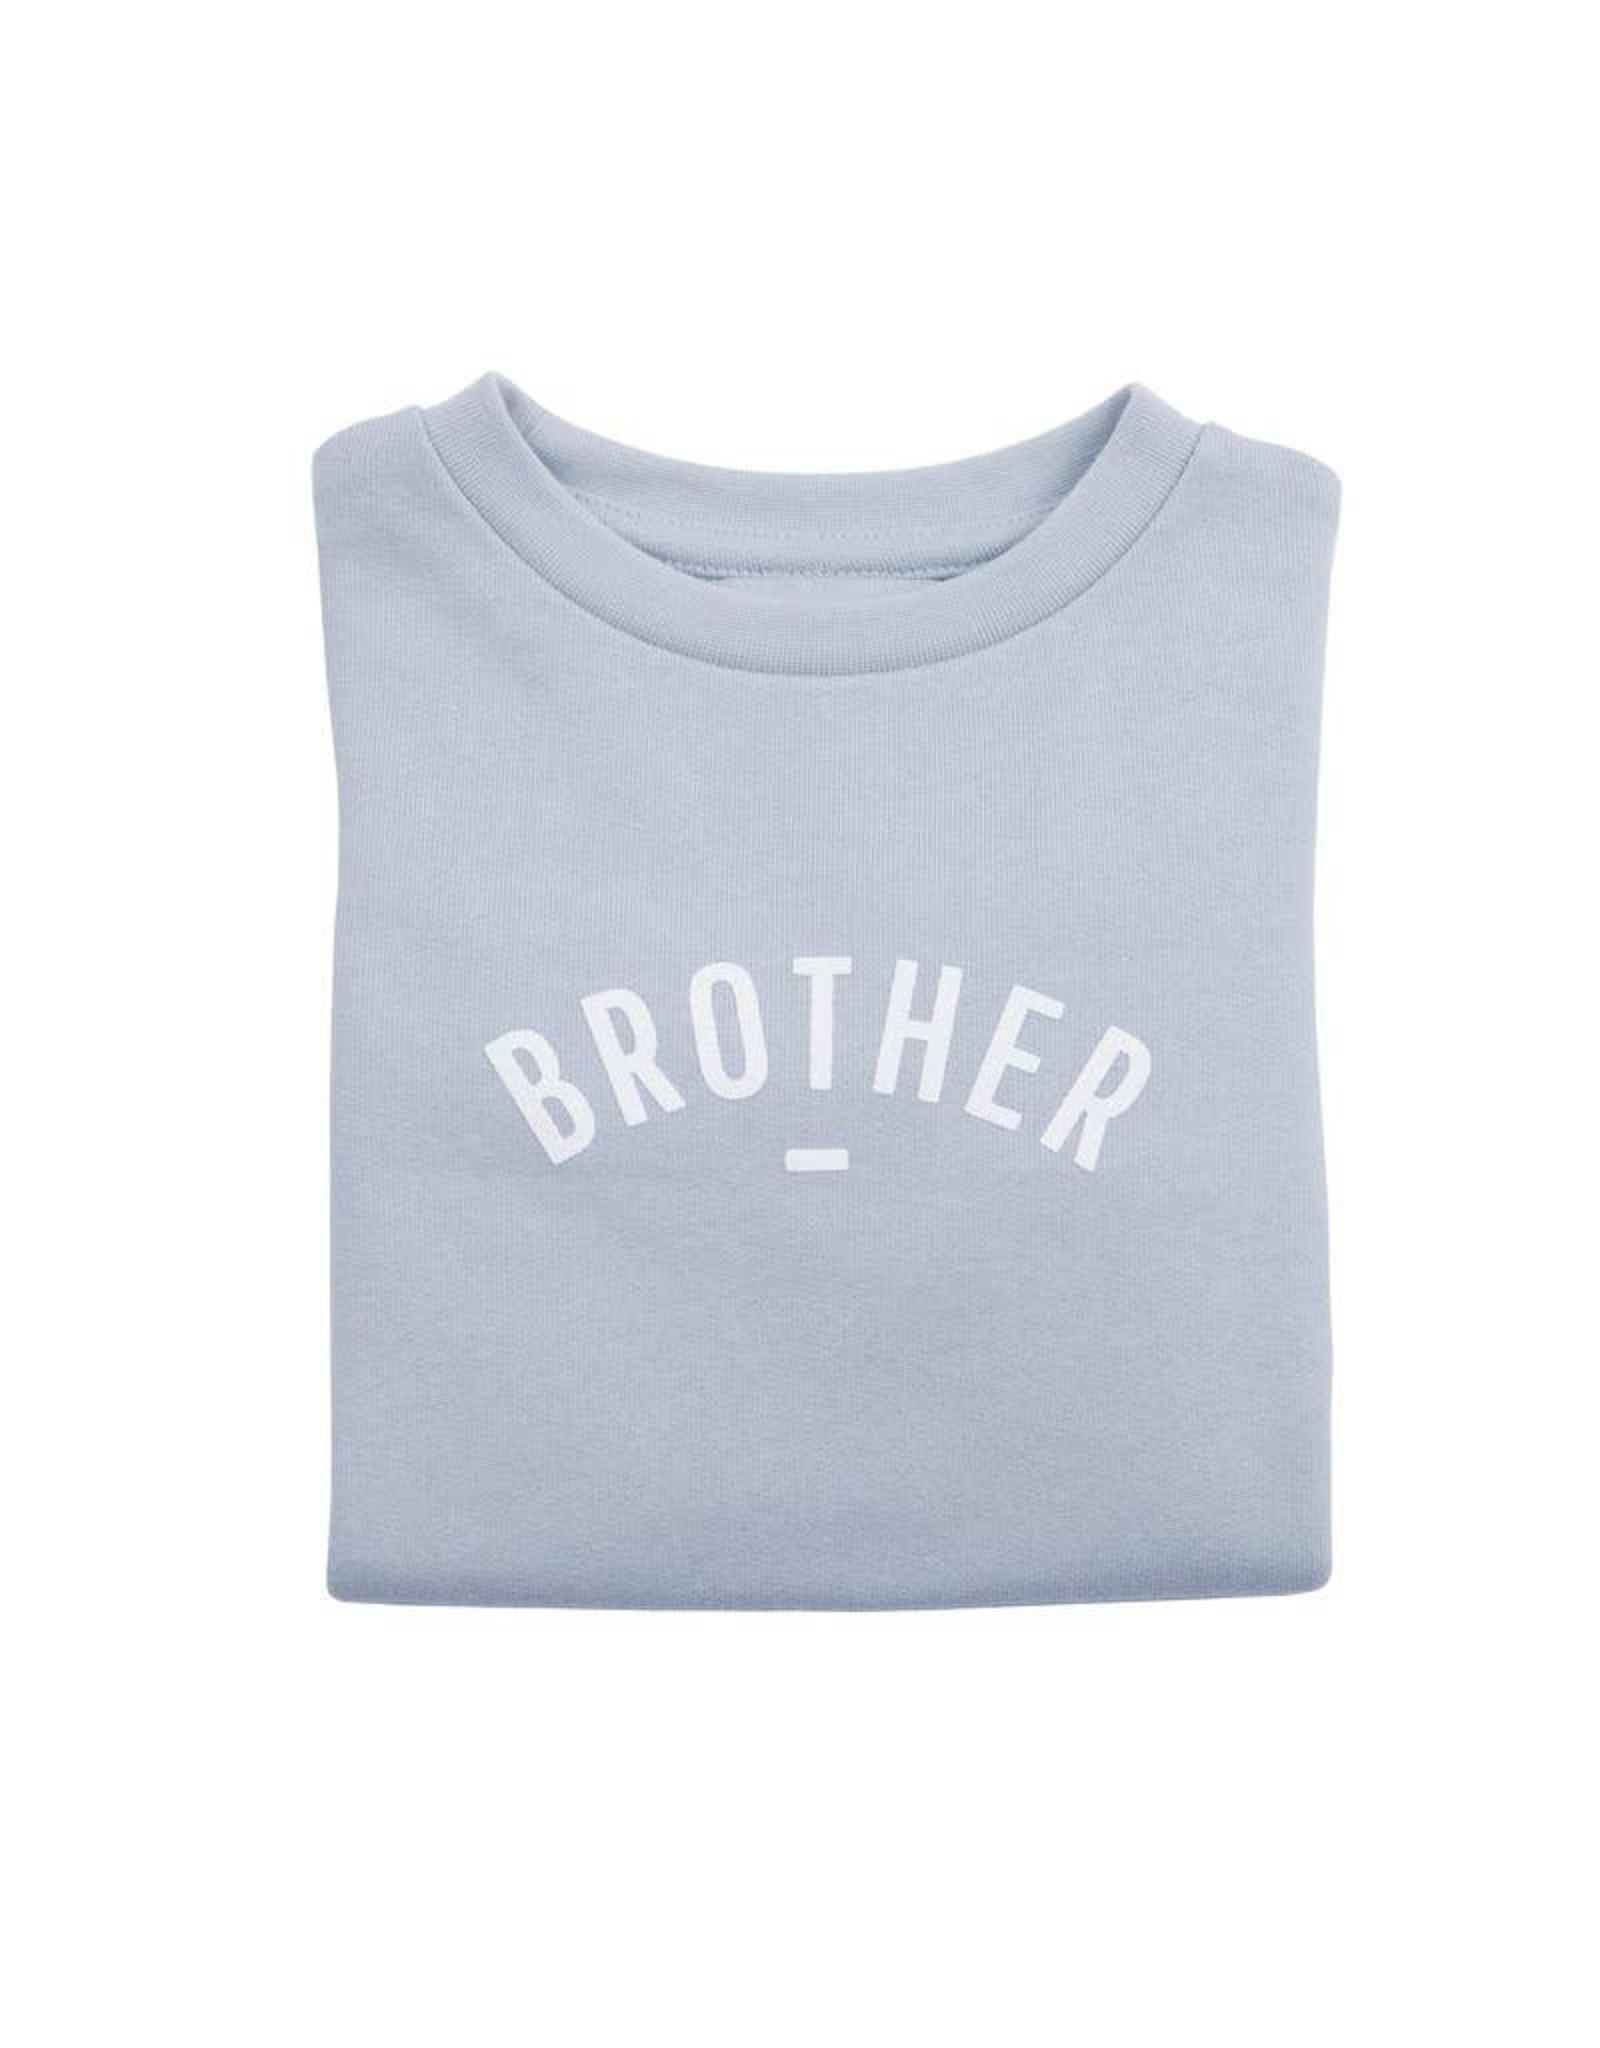 Bob & blossom Mouse Grey Brother Sweatshirt